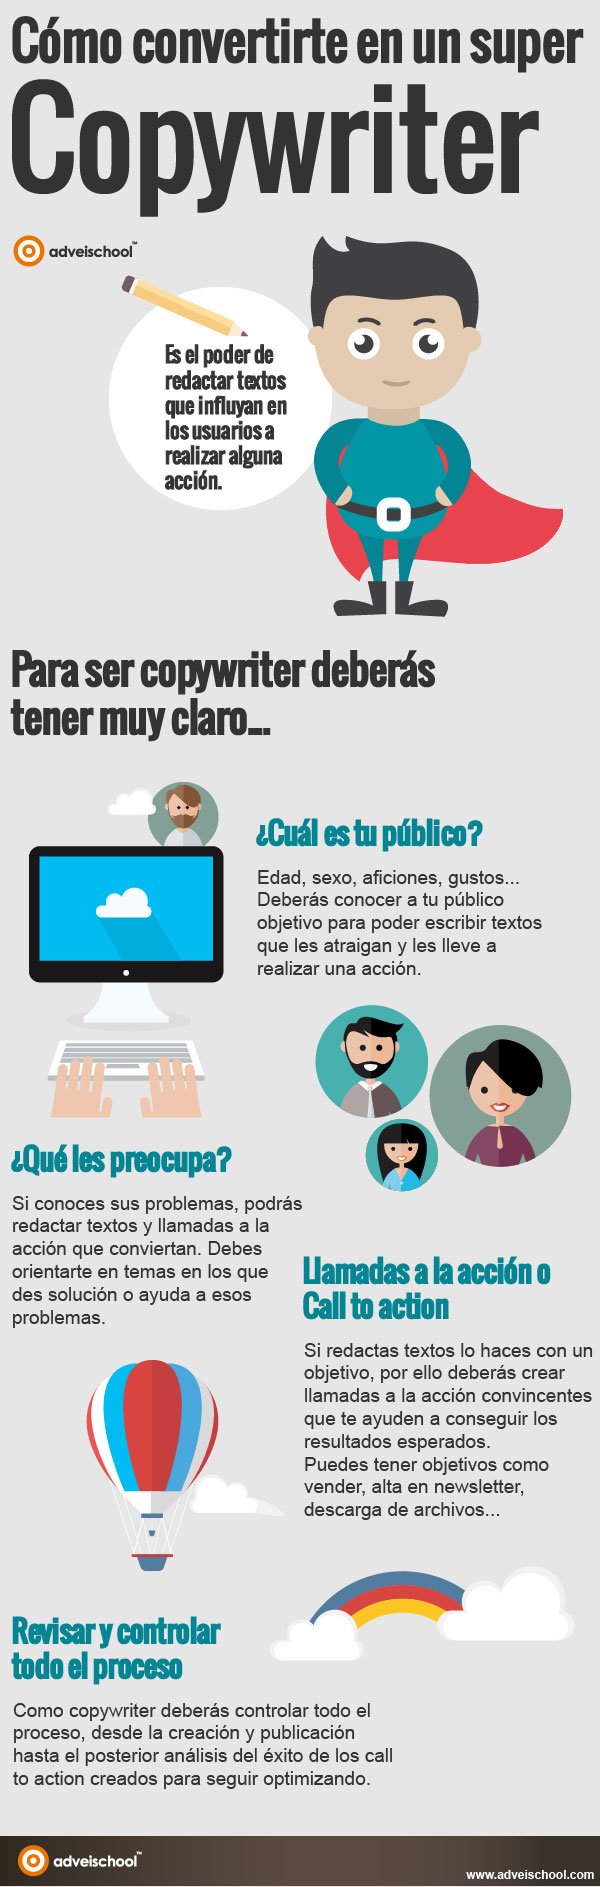 Cómo convertirte en un super copywriter